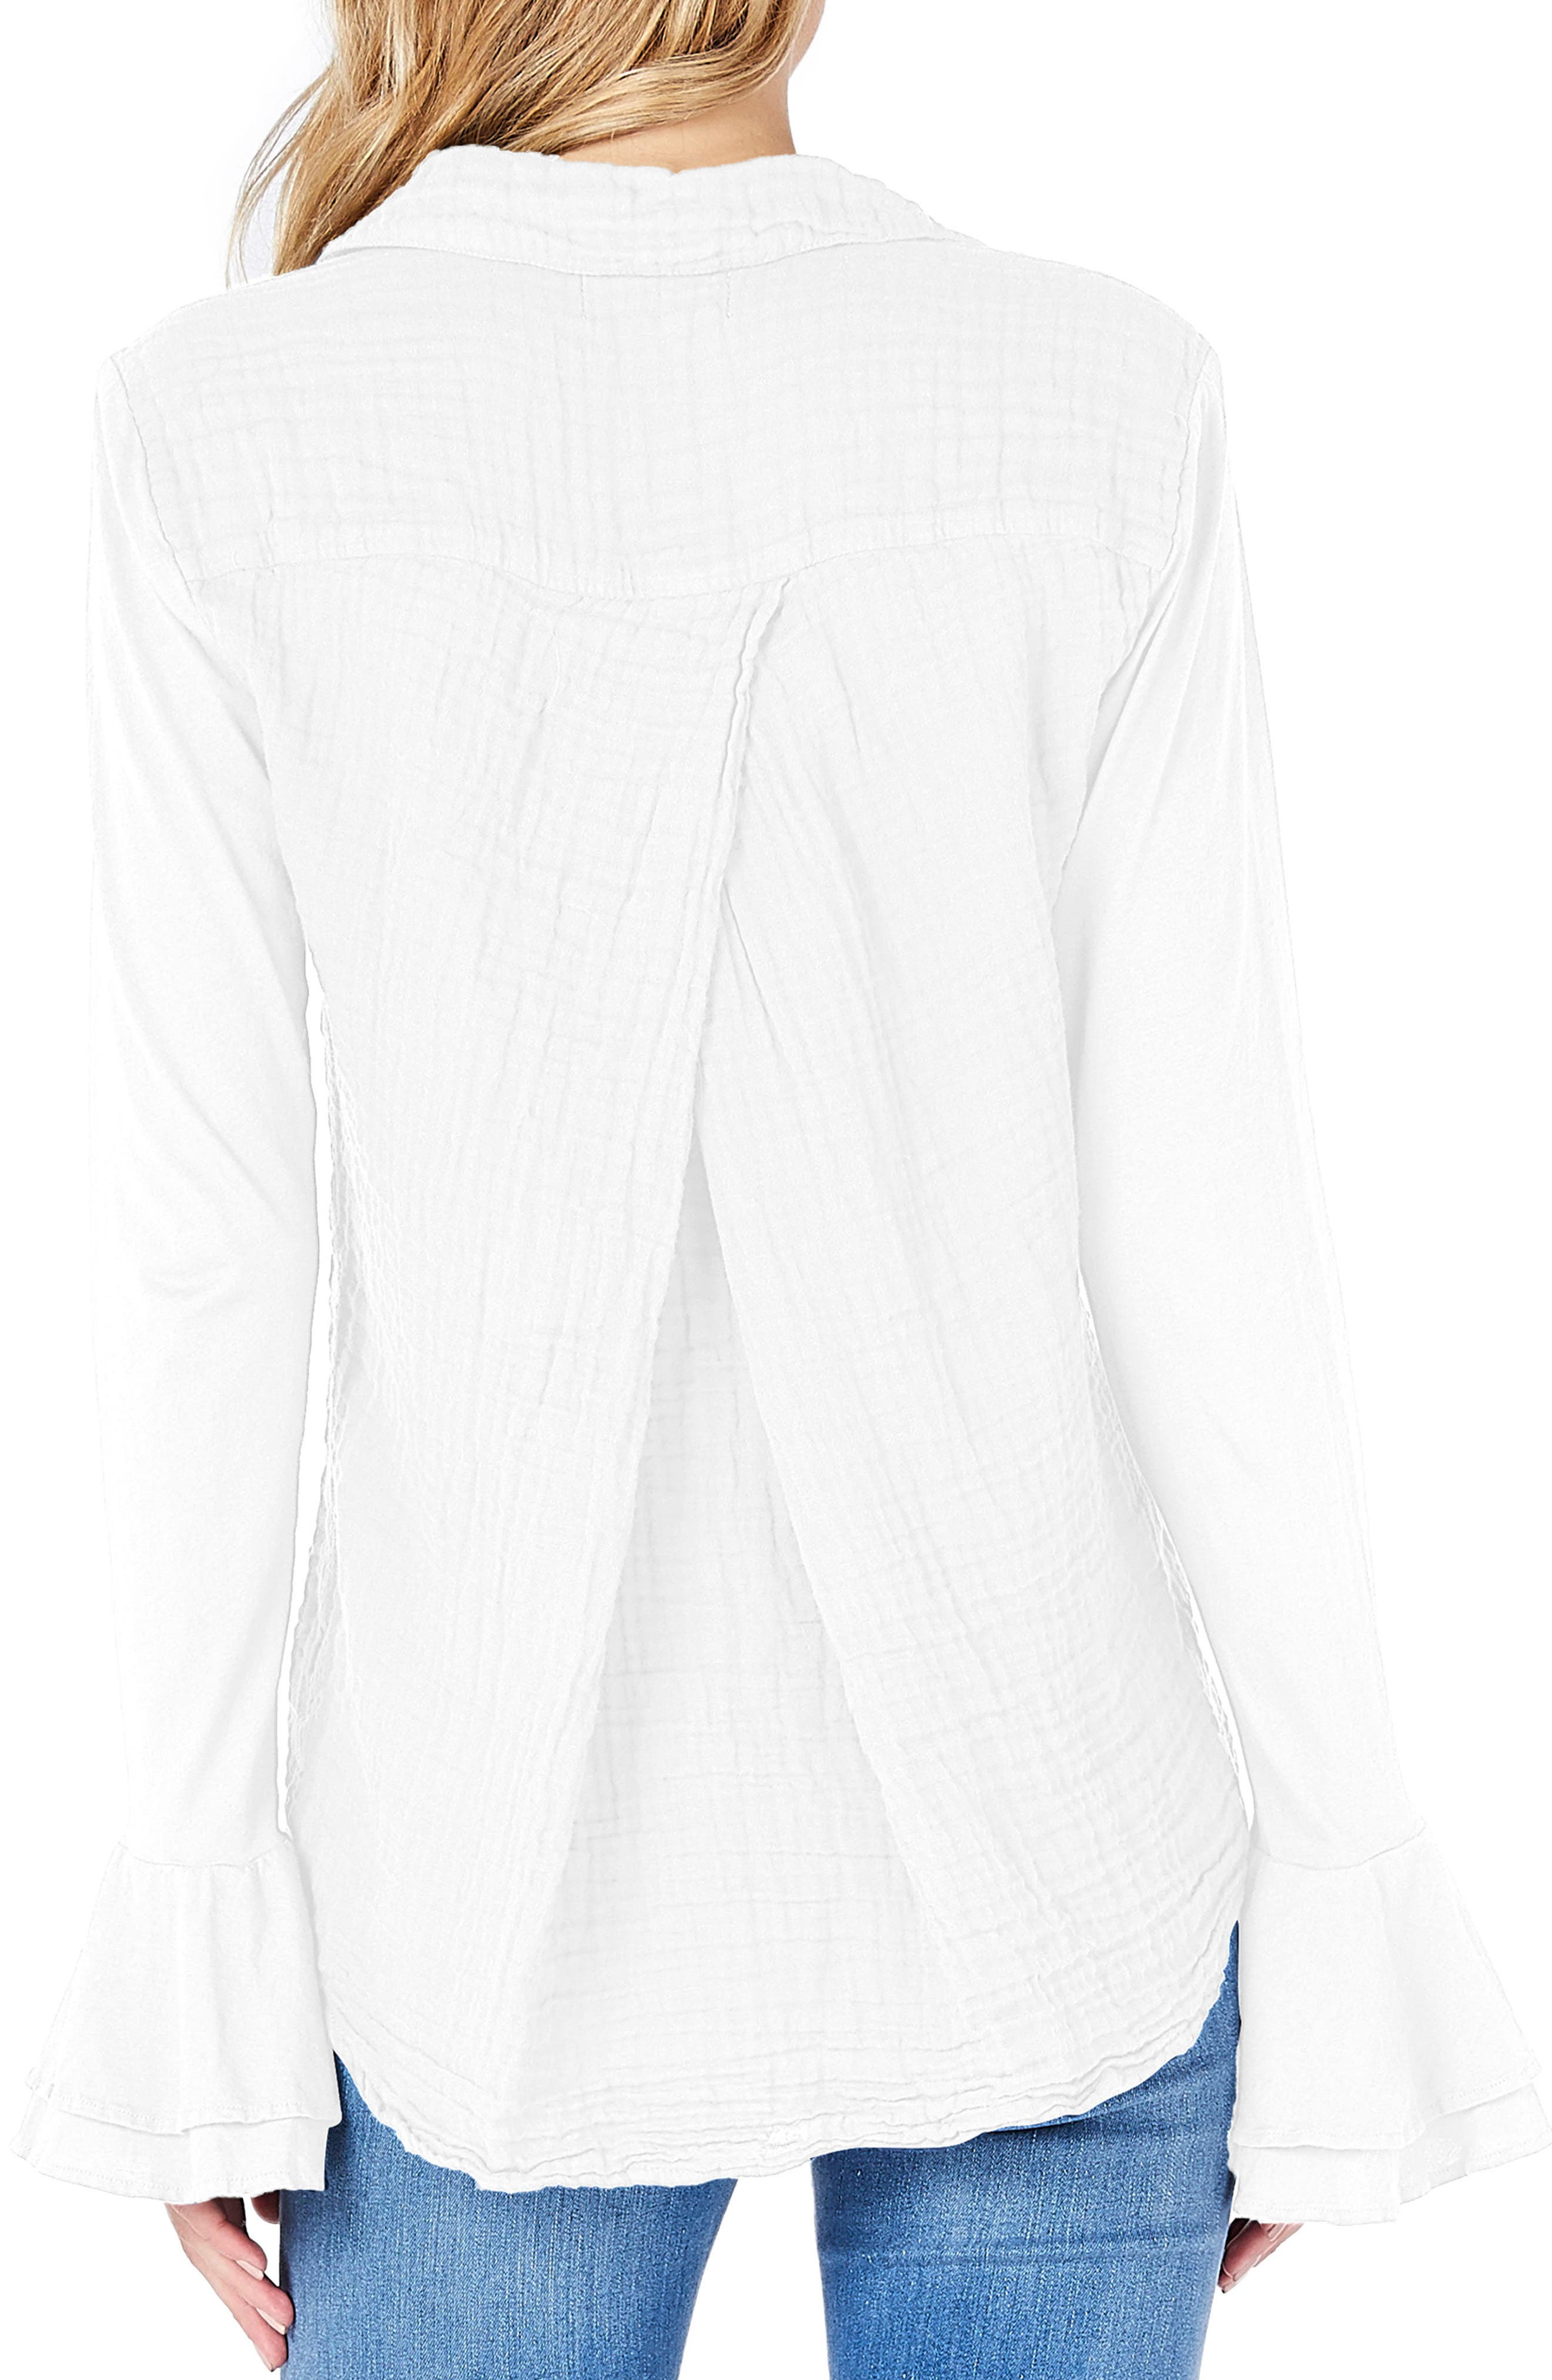 Ruffle Sleeve Shirt,                             Alternate thumbnail 2, color,                             White